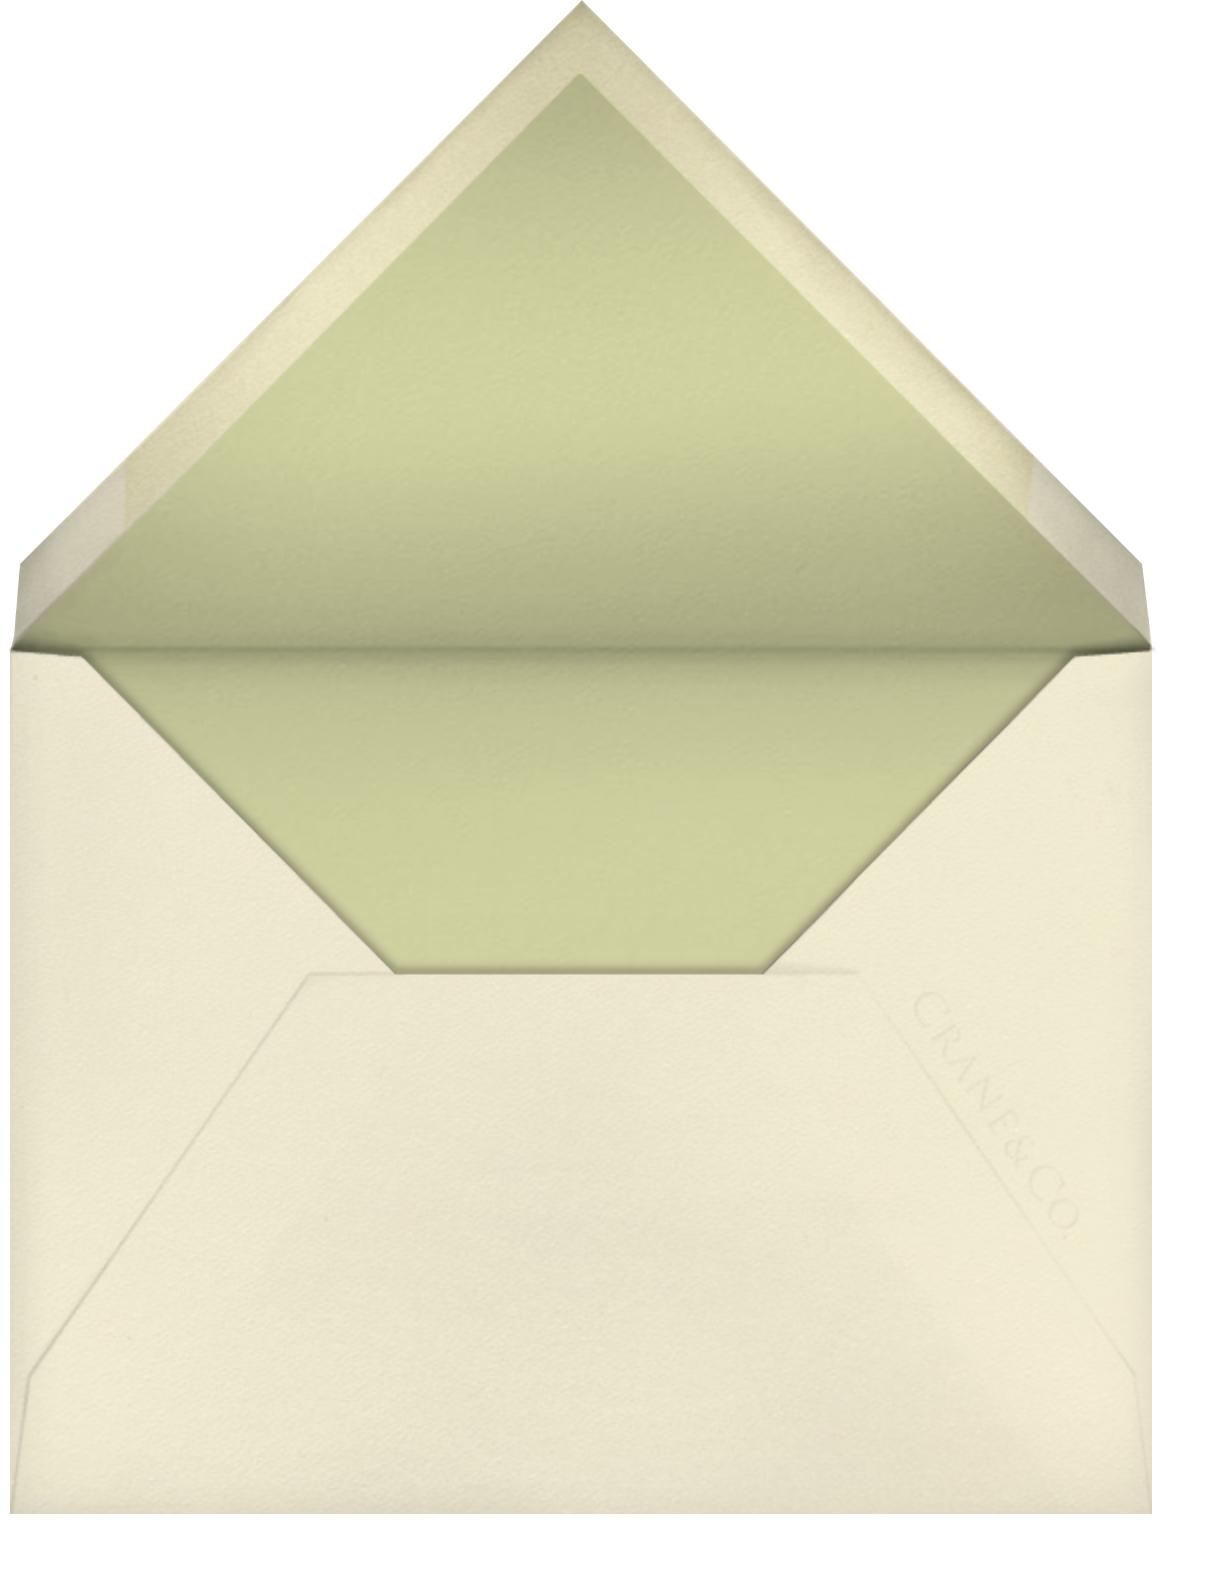 Quill I - Celery - Paperless Post - All - envelope back